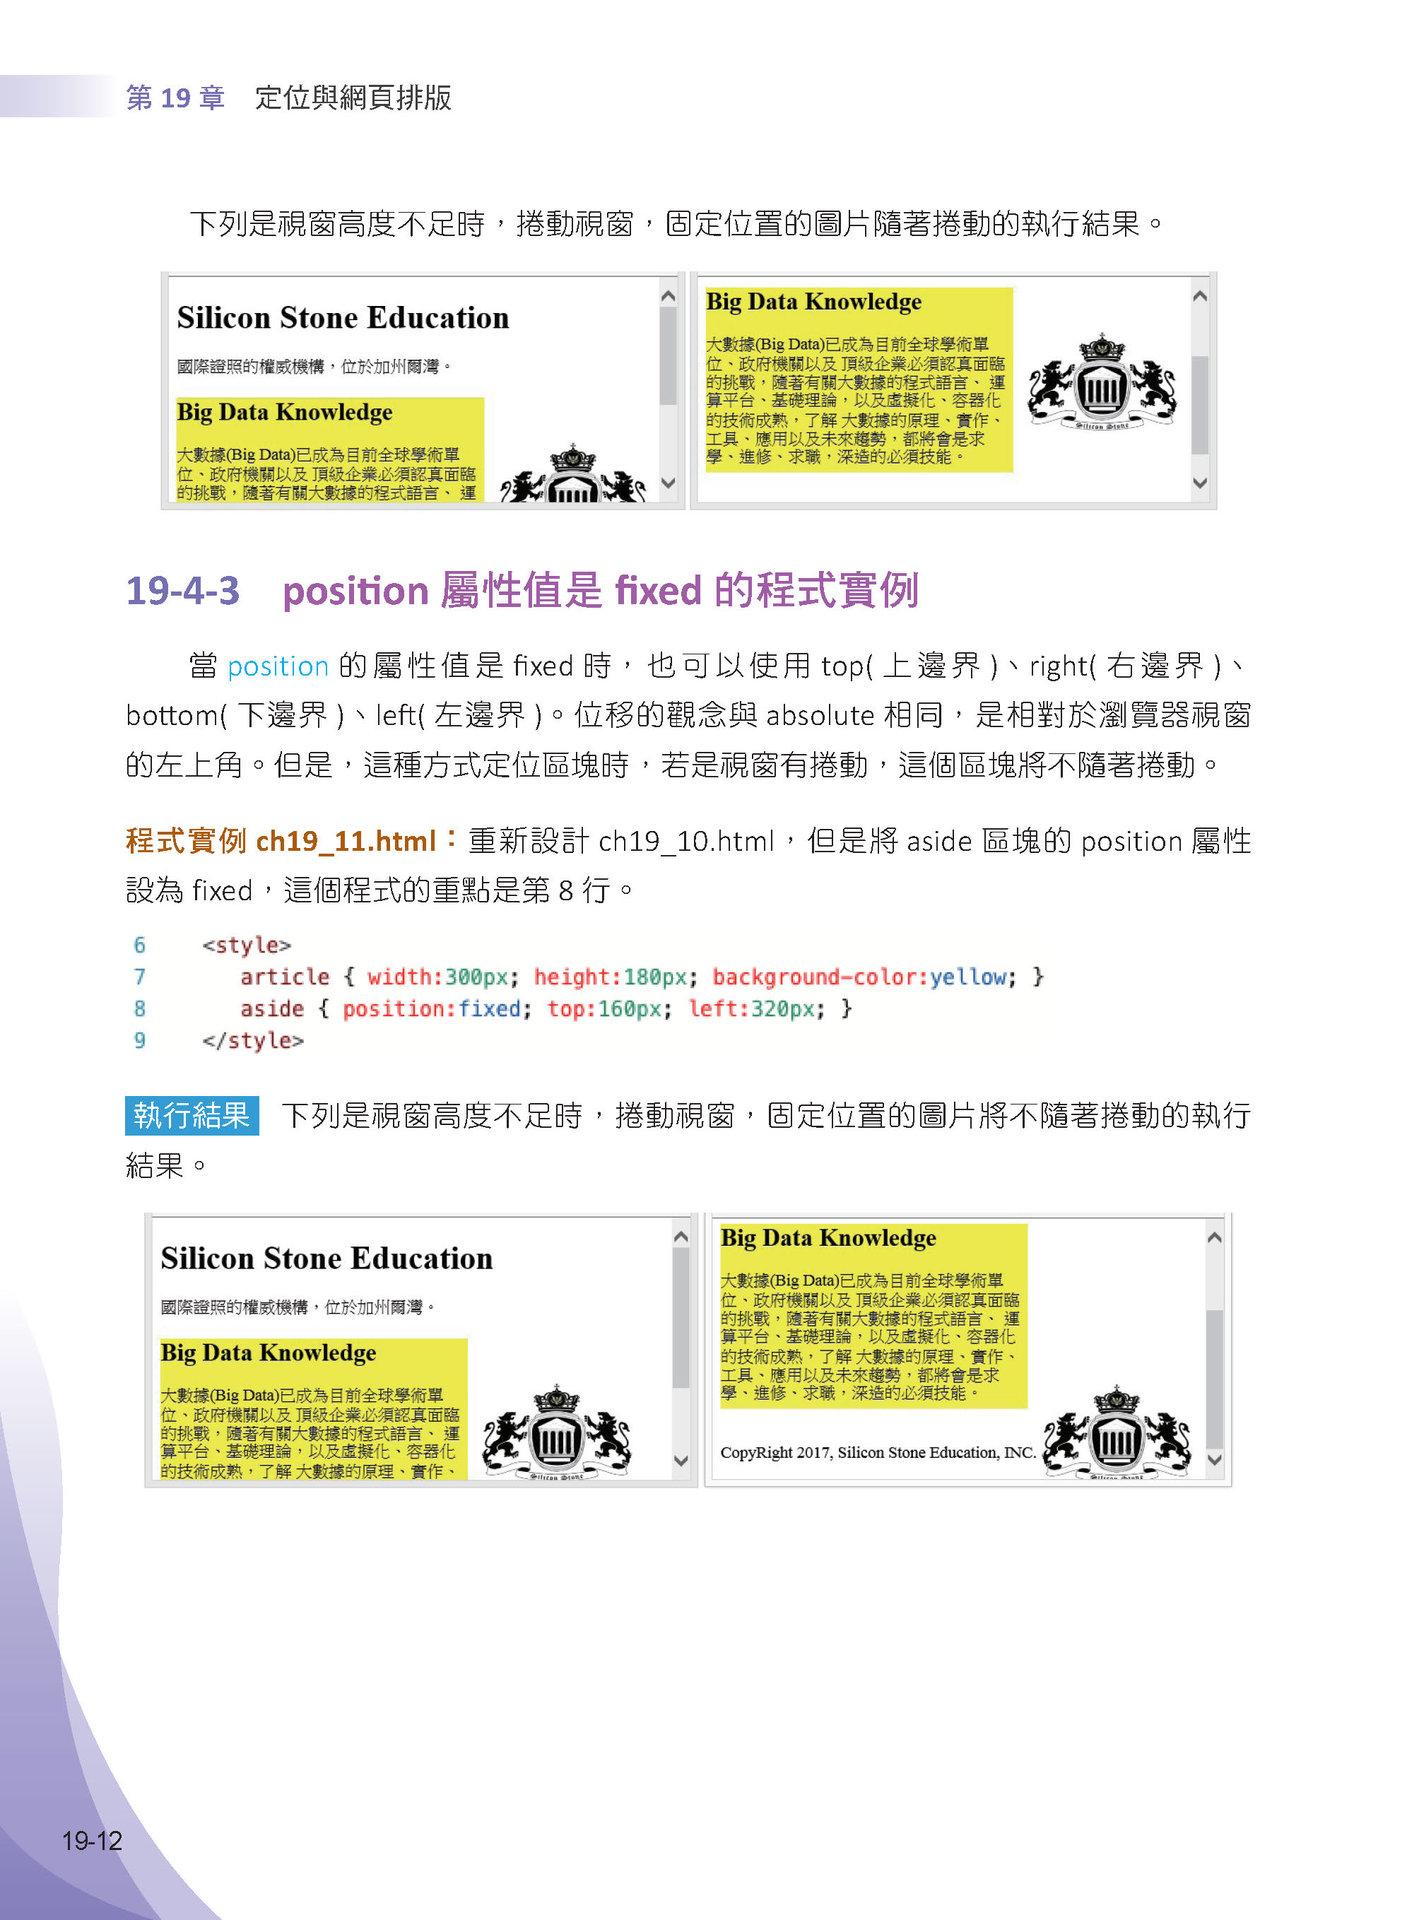 最完整跨平台網頁設計:HTML + CSS + JavaScript + jQuery + Bootstrap + Google Maps (全彩印刷)-preview-3